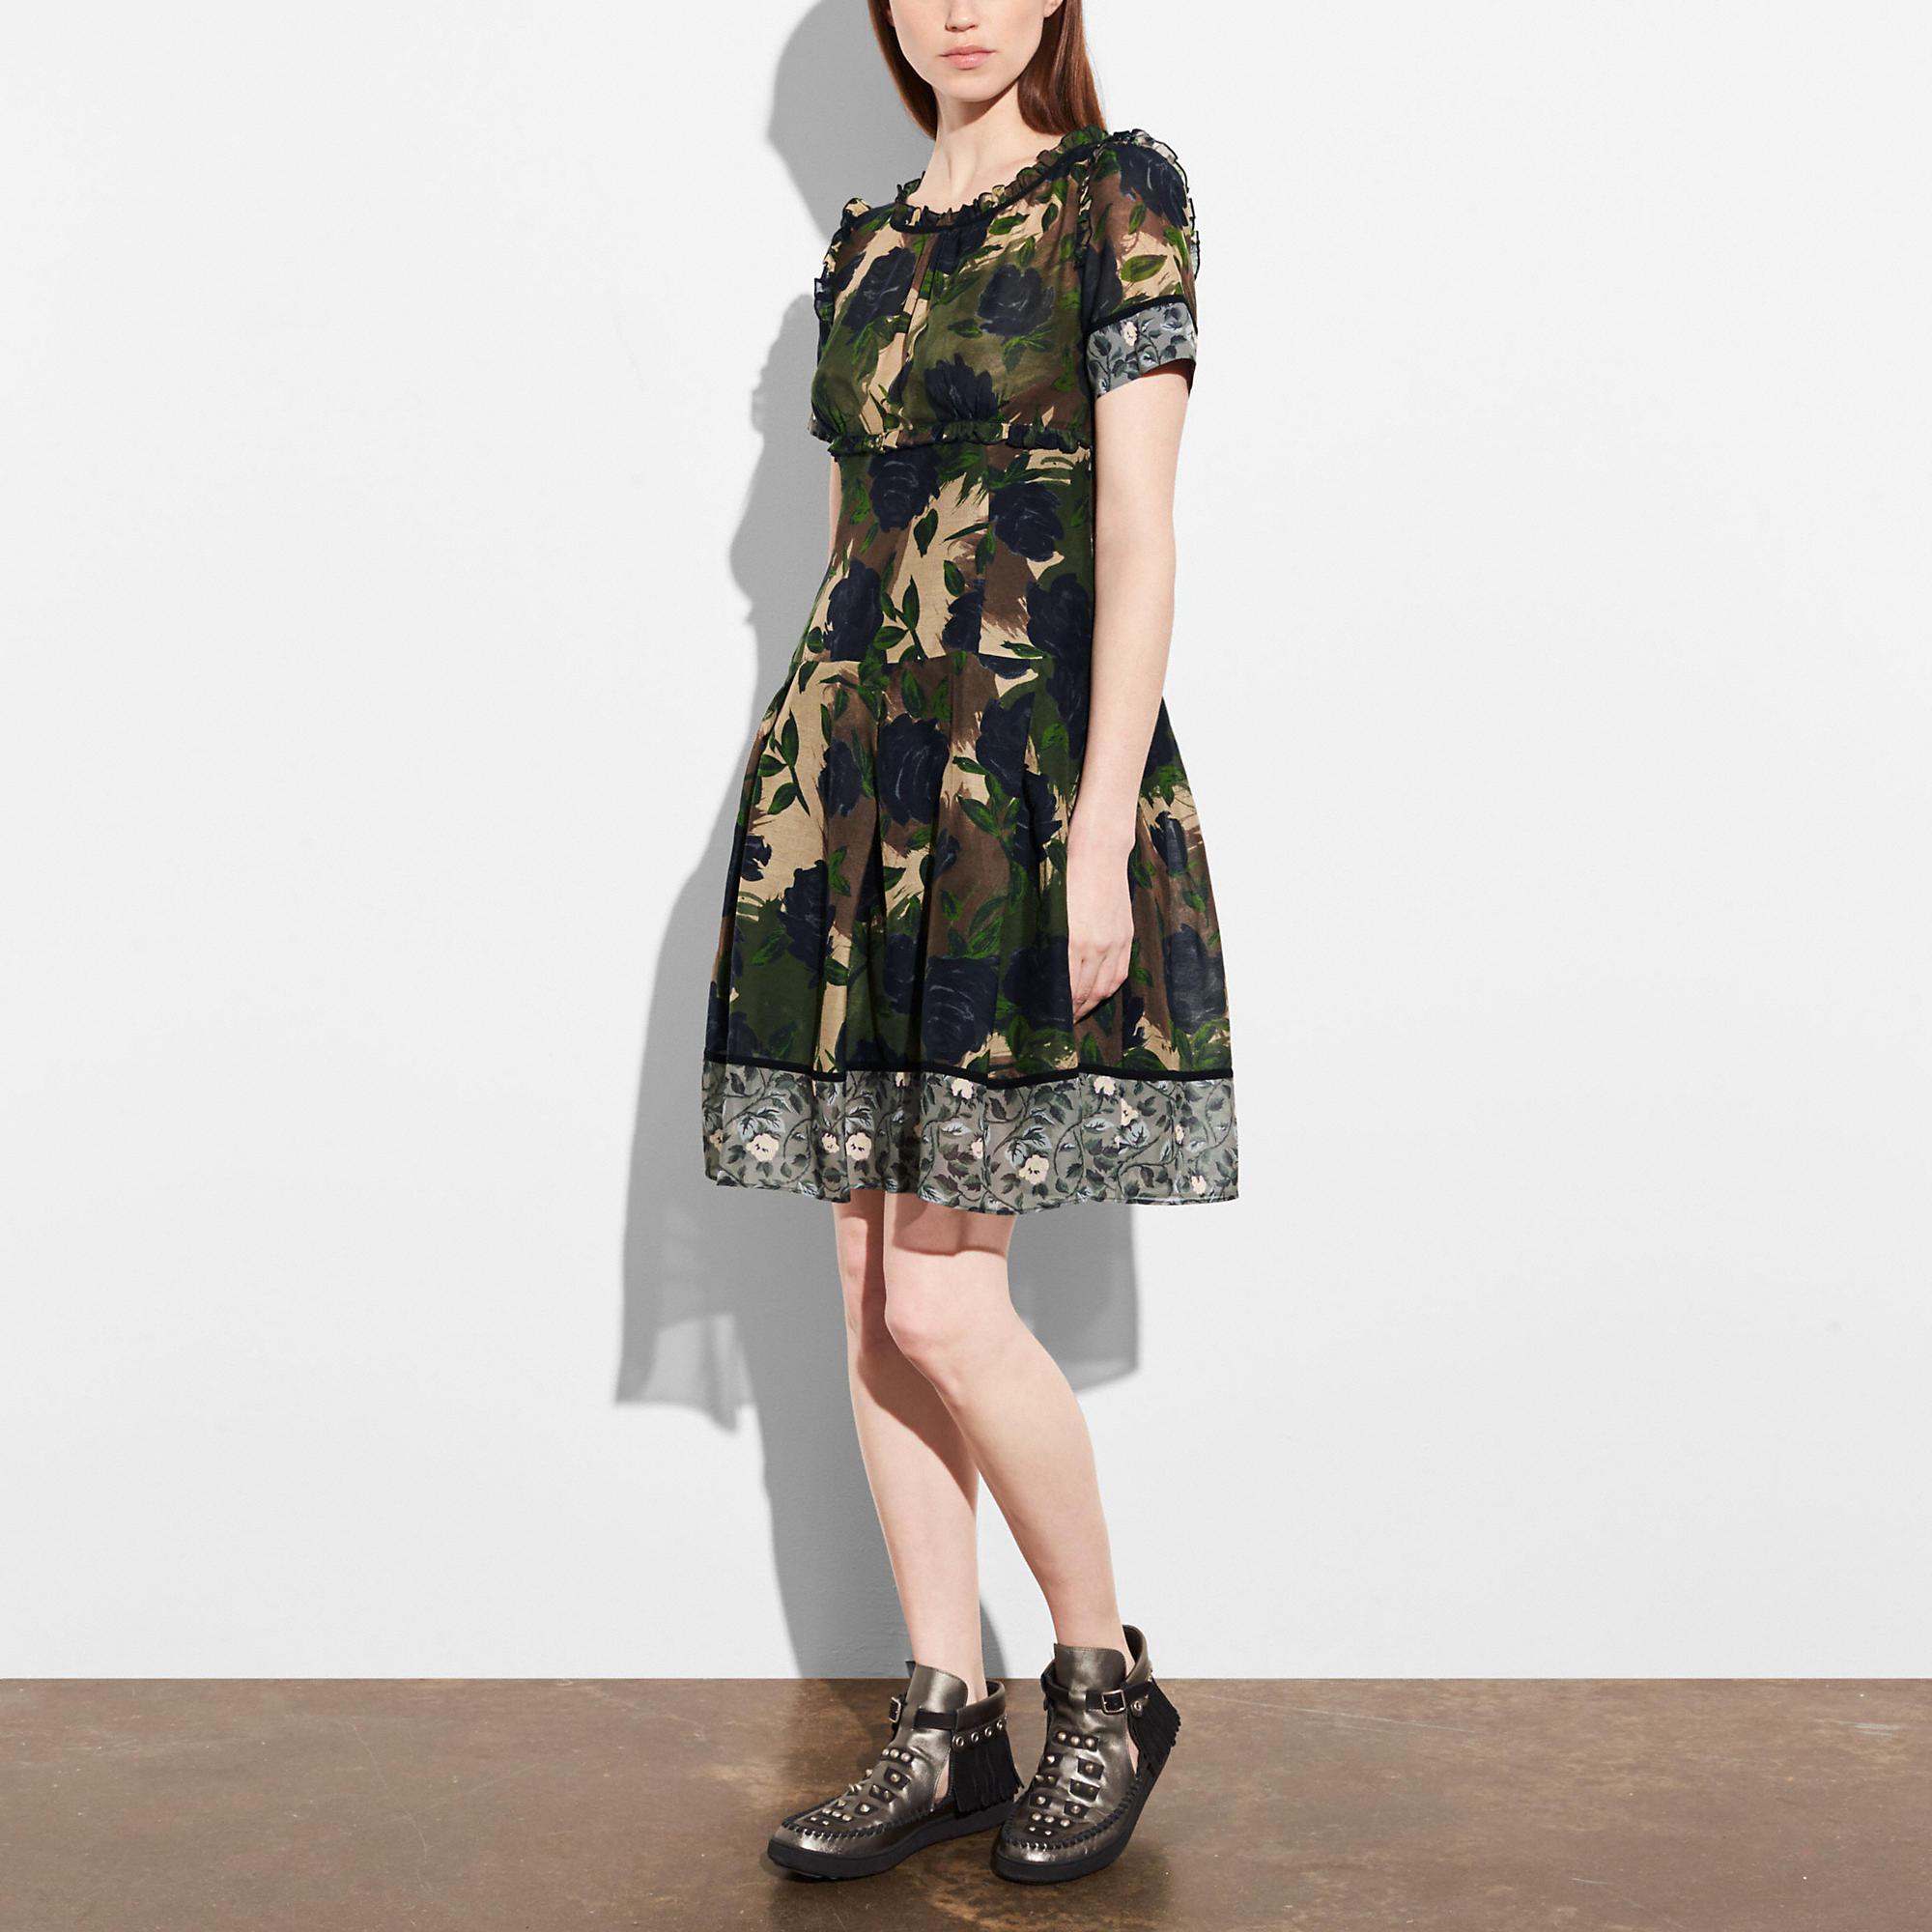 Coach Mixed Print Dress